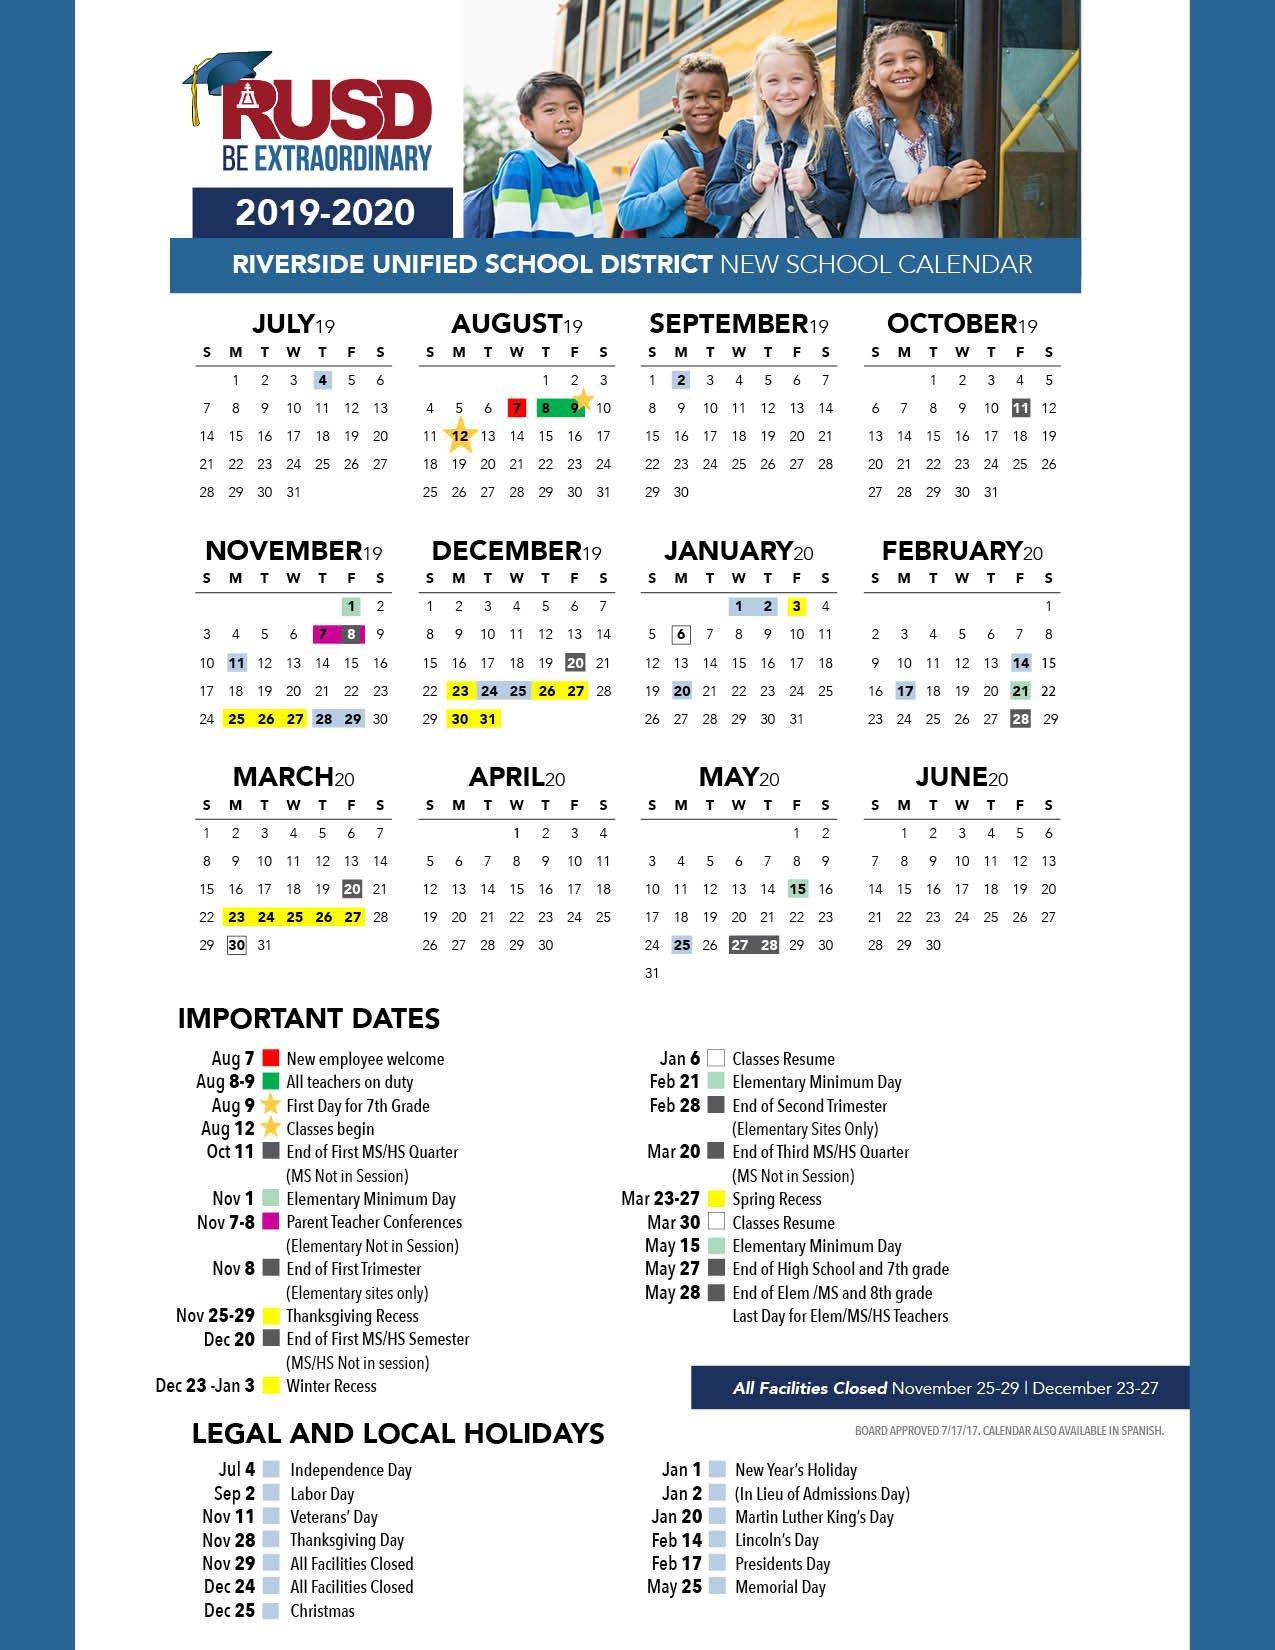 District Calendar - Riverside Unified School District Cal U Calendar 2019